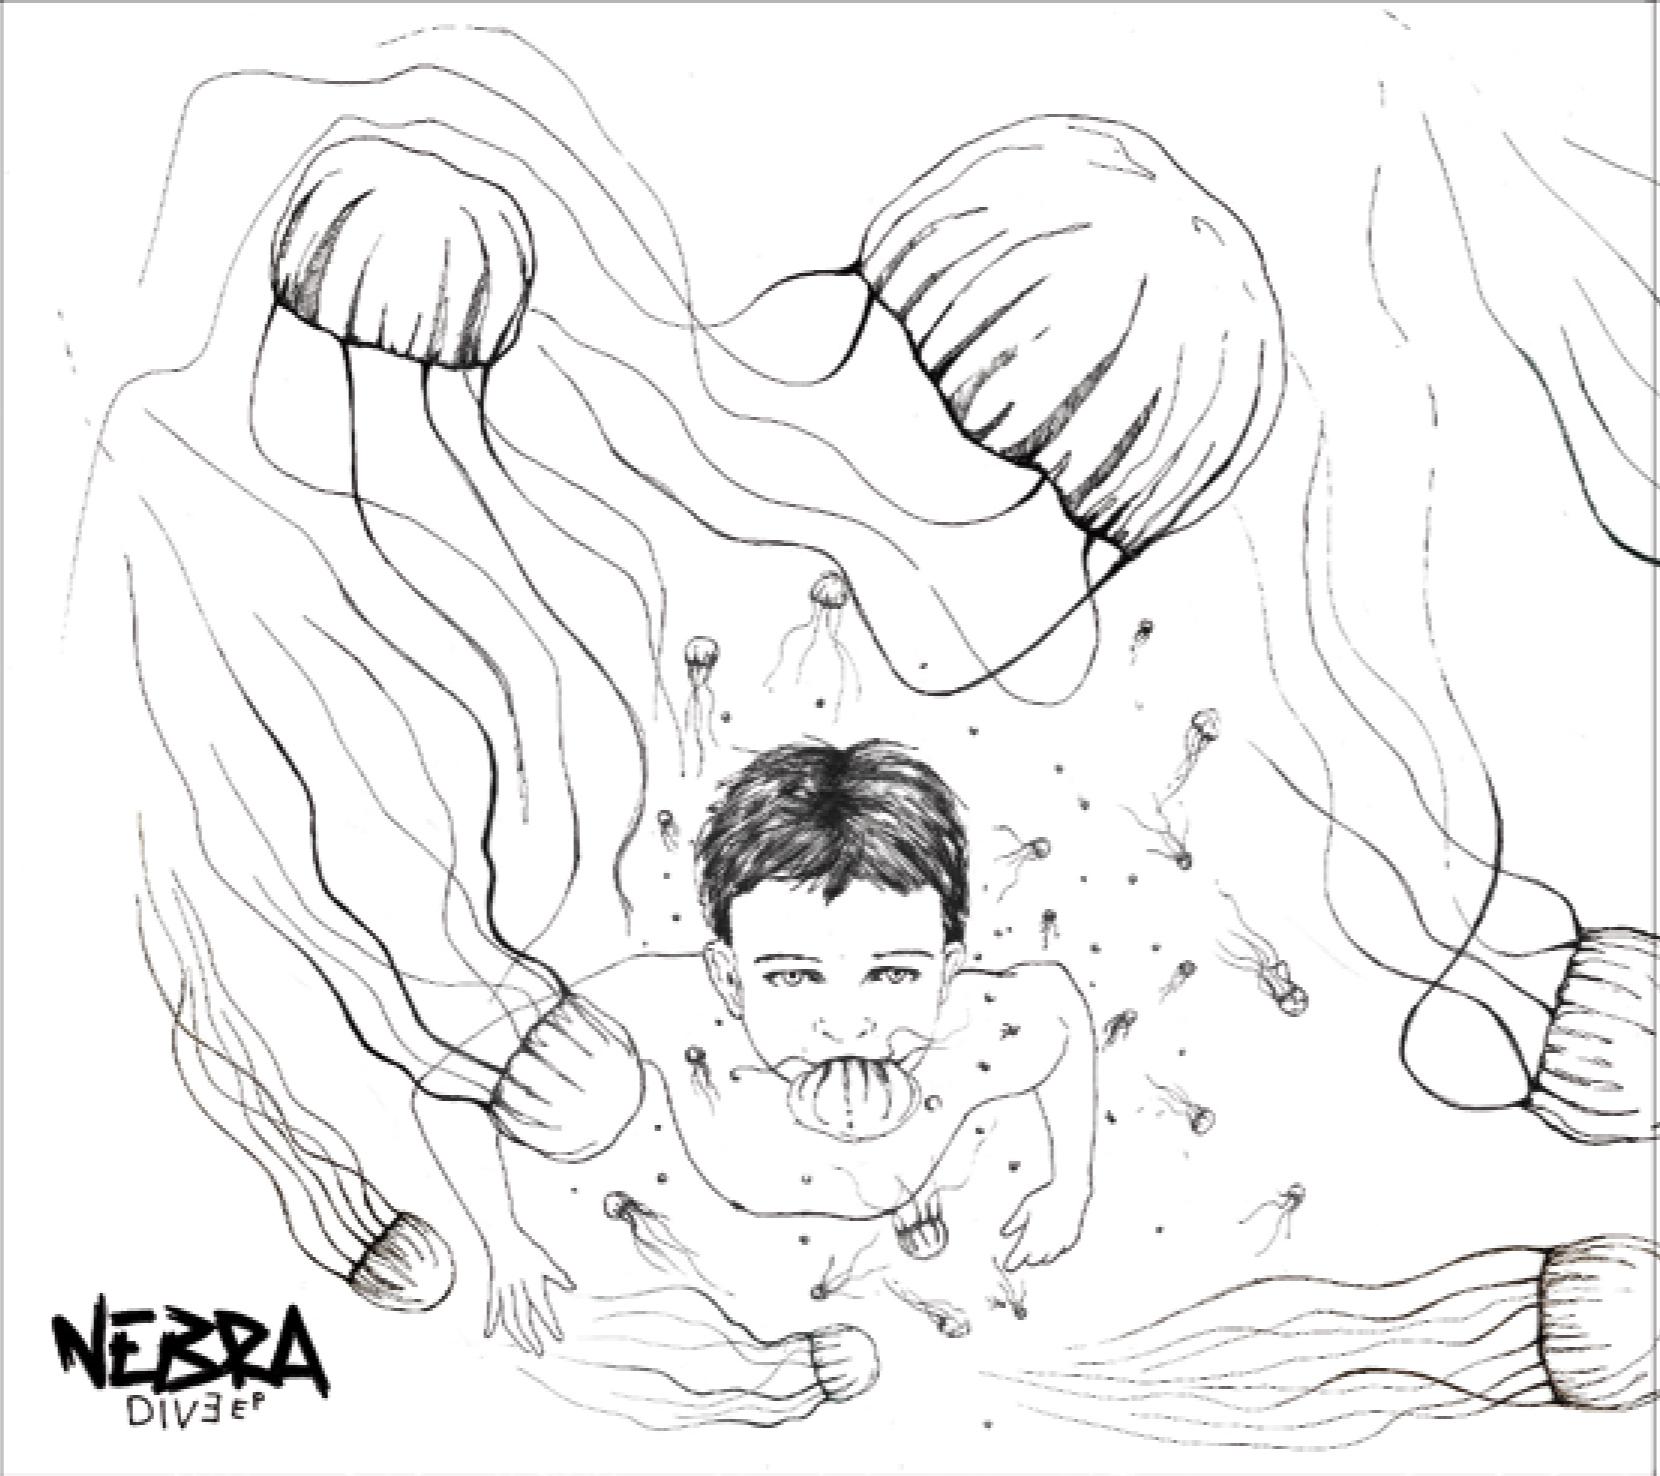 Nebra – Dive EP